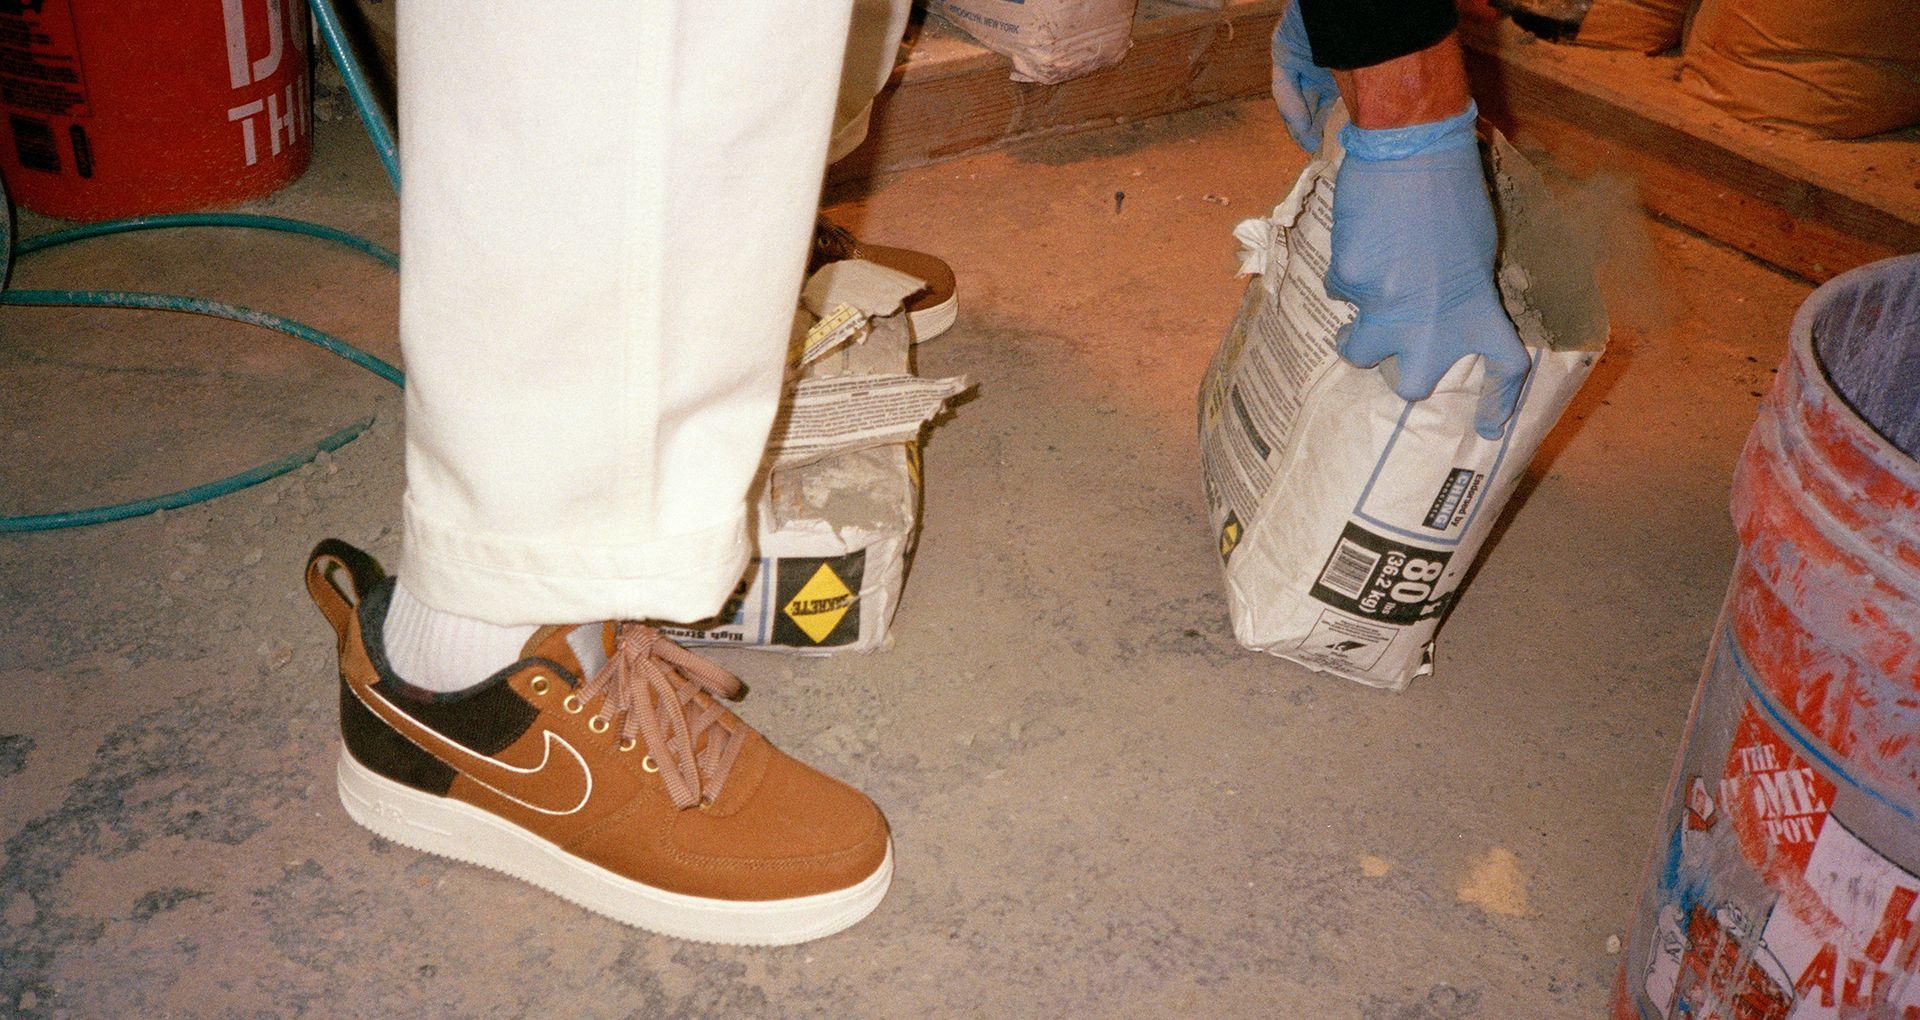 Nike 1 Release DateNikeSnkrs Force Air Wip' 'carhartt osQhBrCxtd